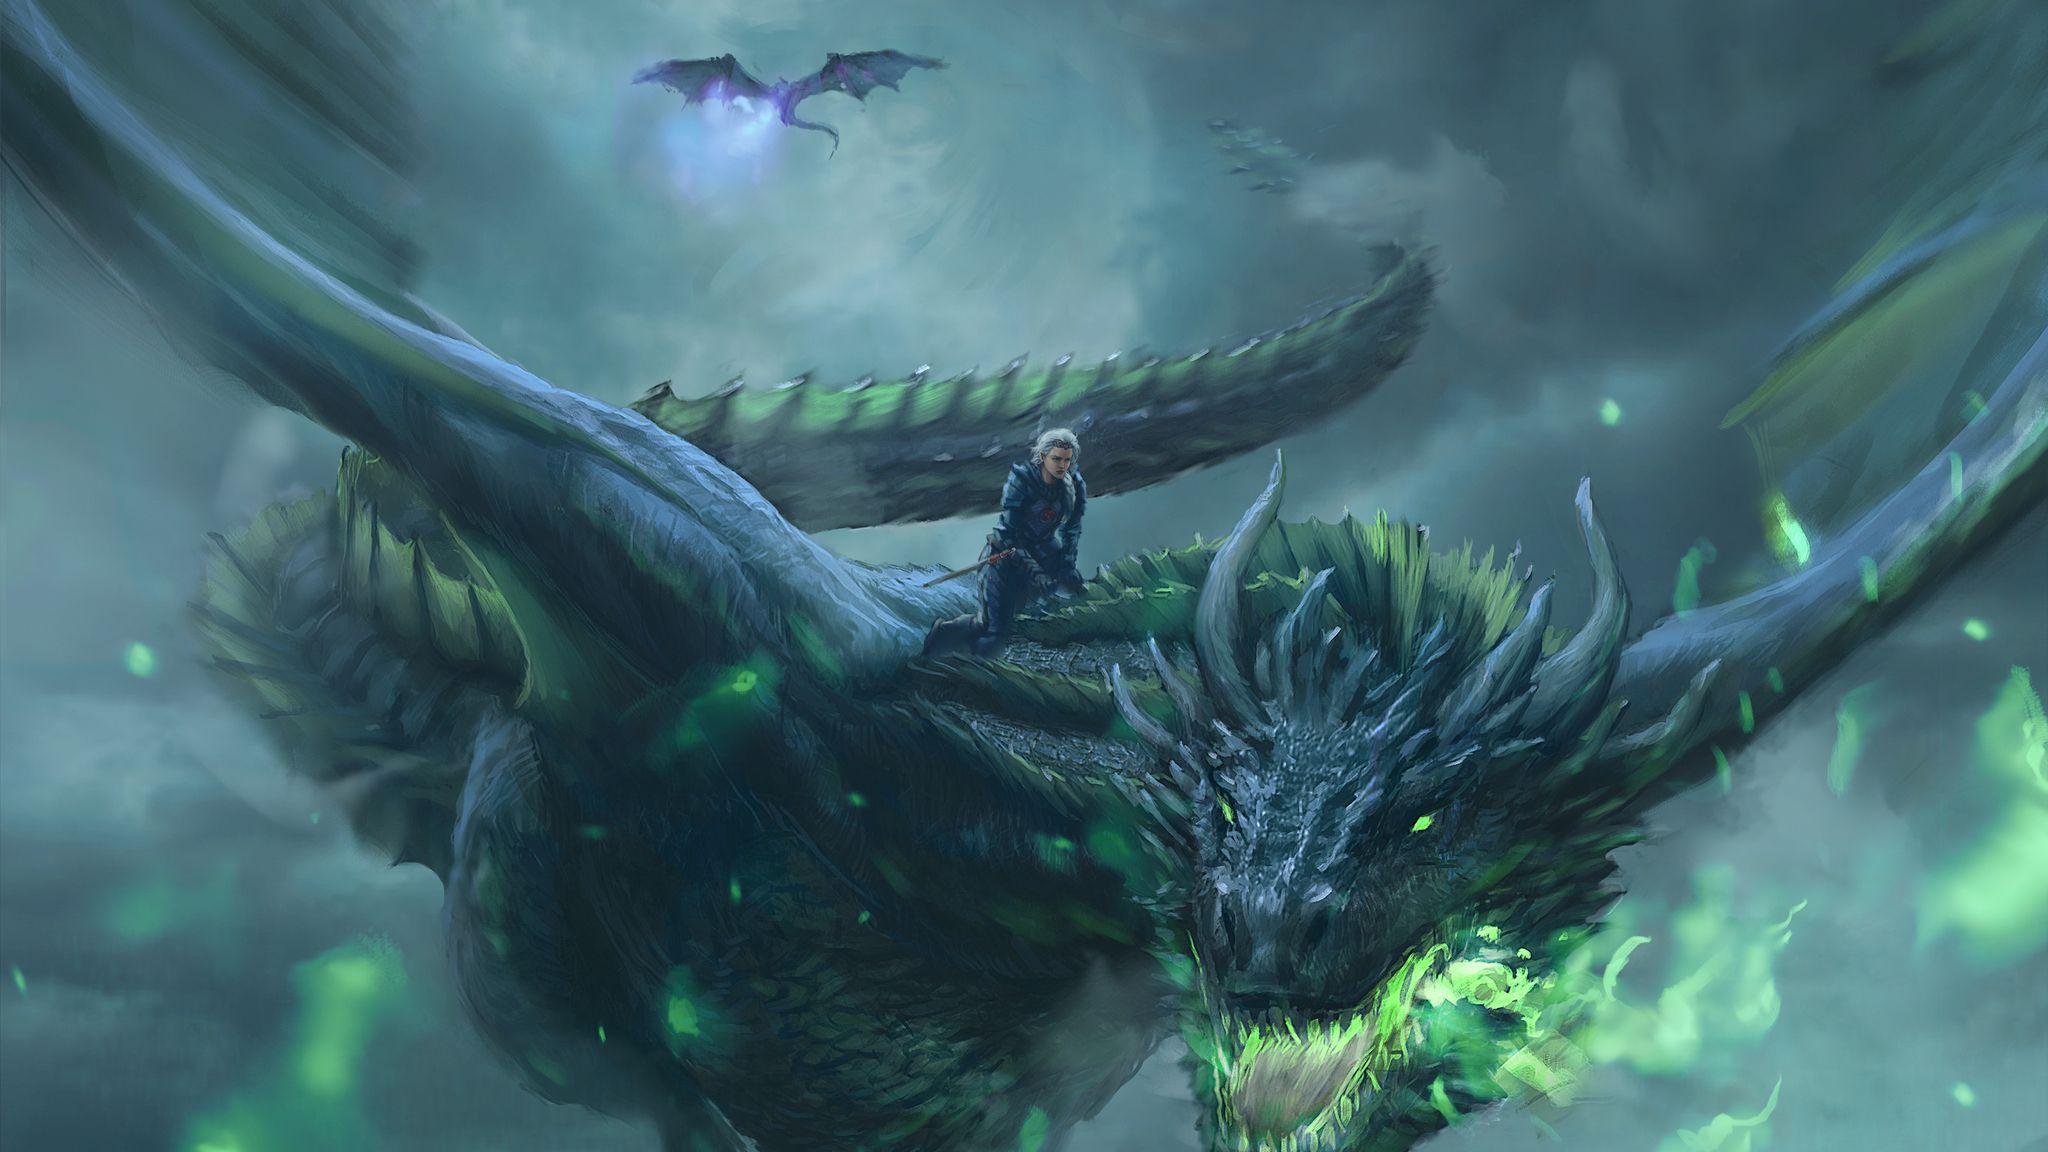 Game Of Thrones 8 Season Wallpaper Iphone Game Of Thrones Art